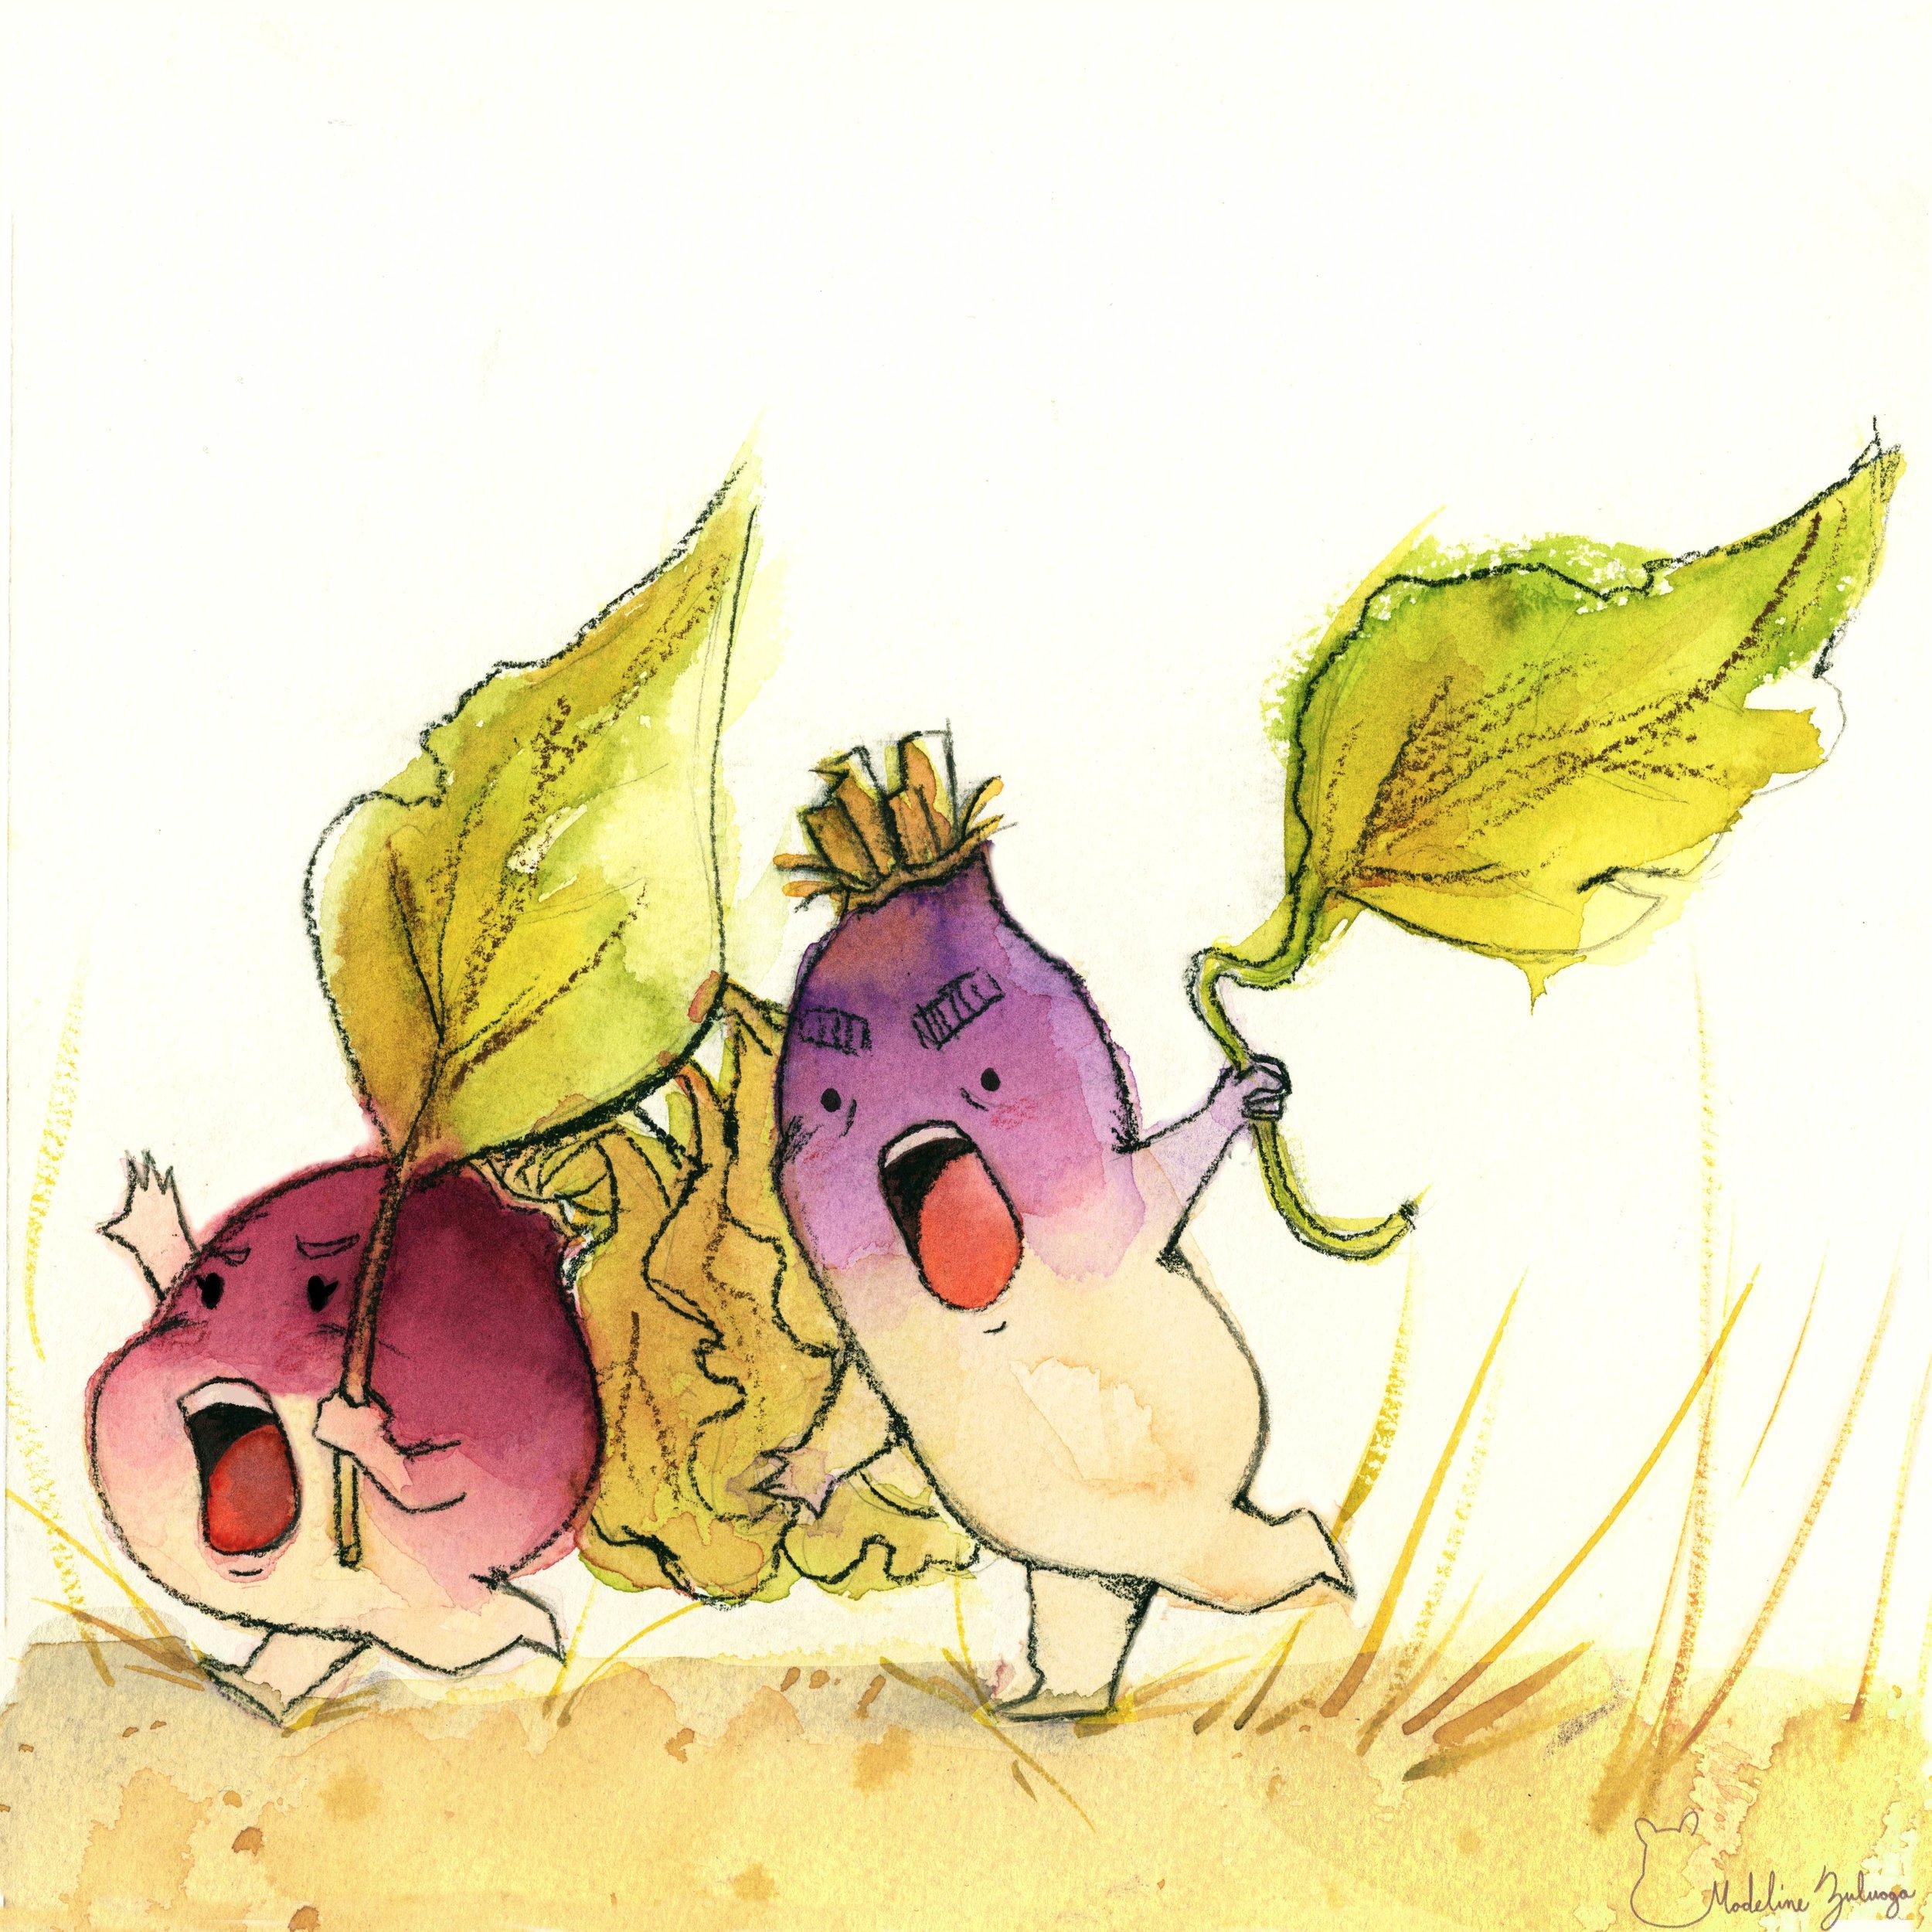 madeline-zuluaga-turnip-parents-.jpg